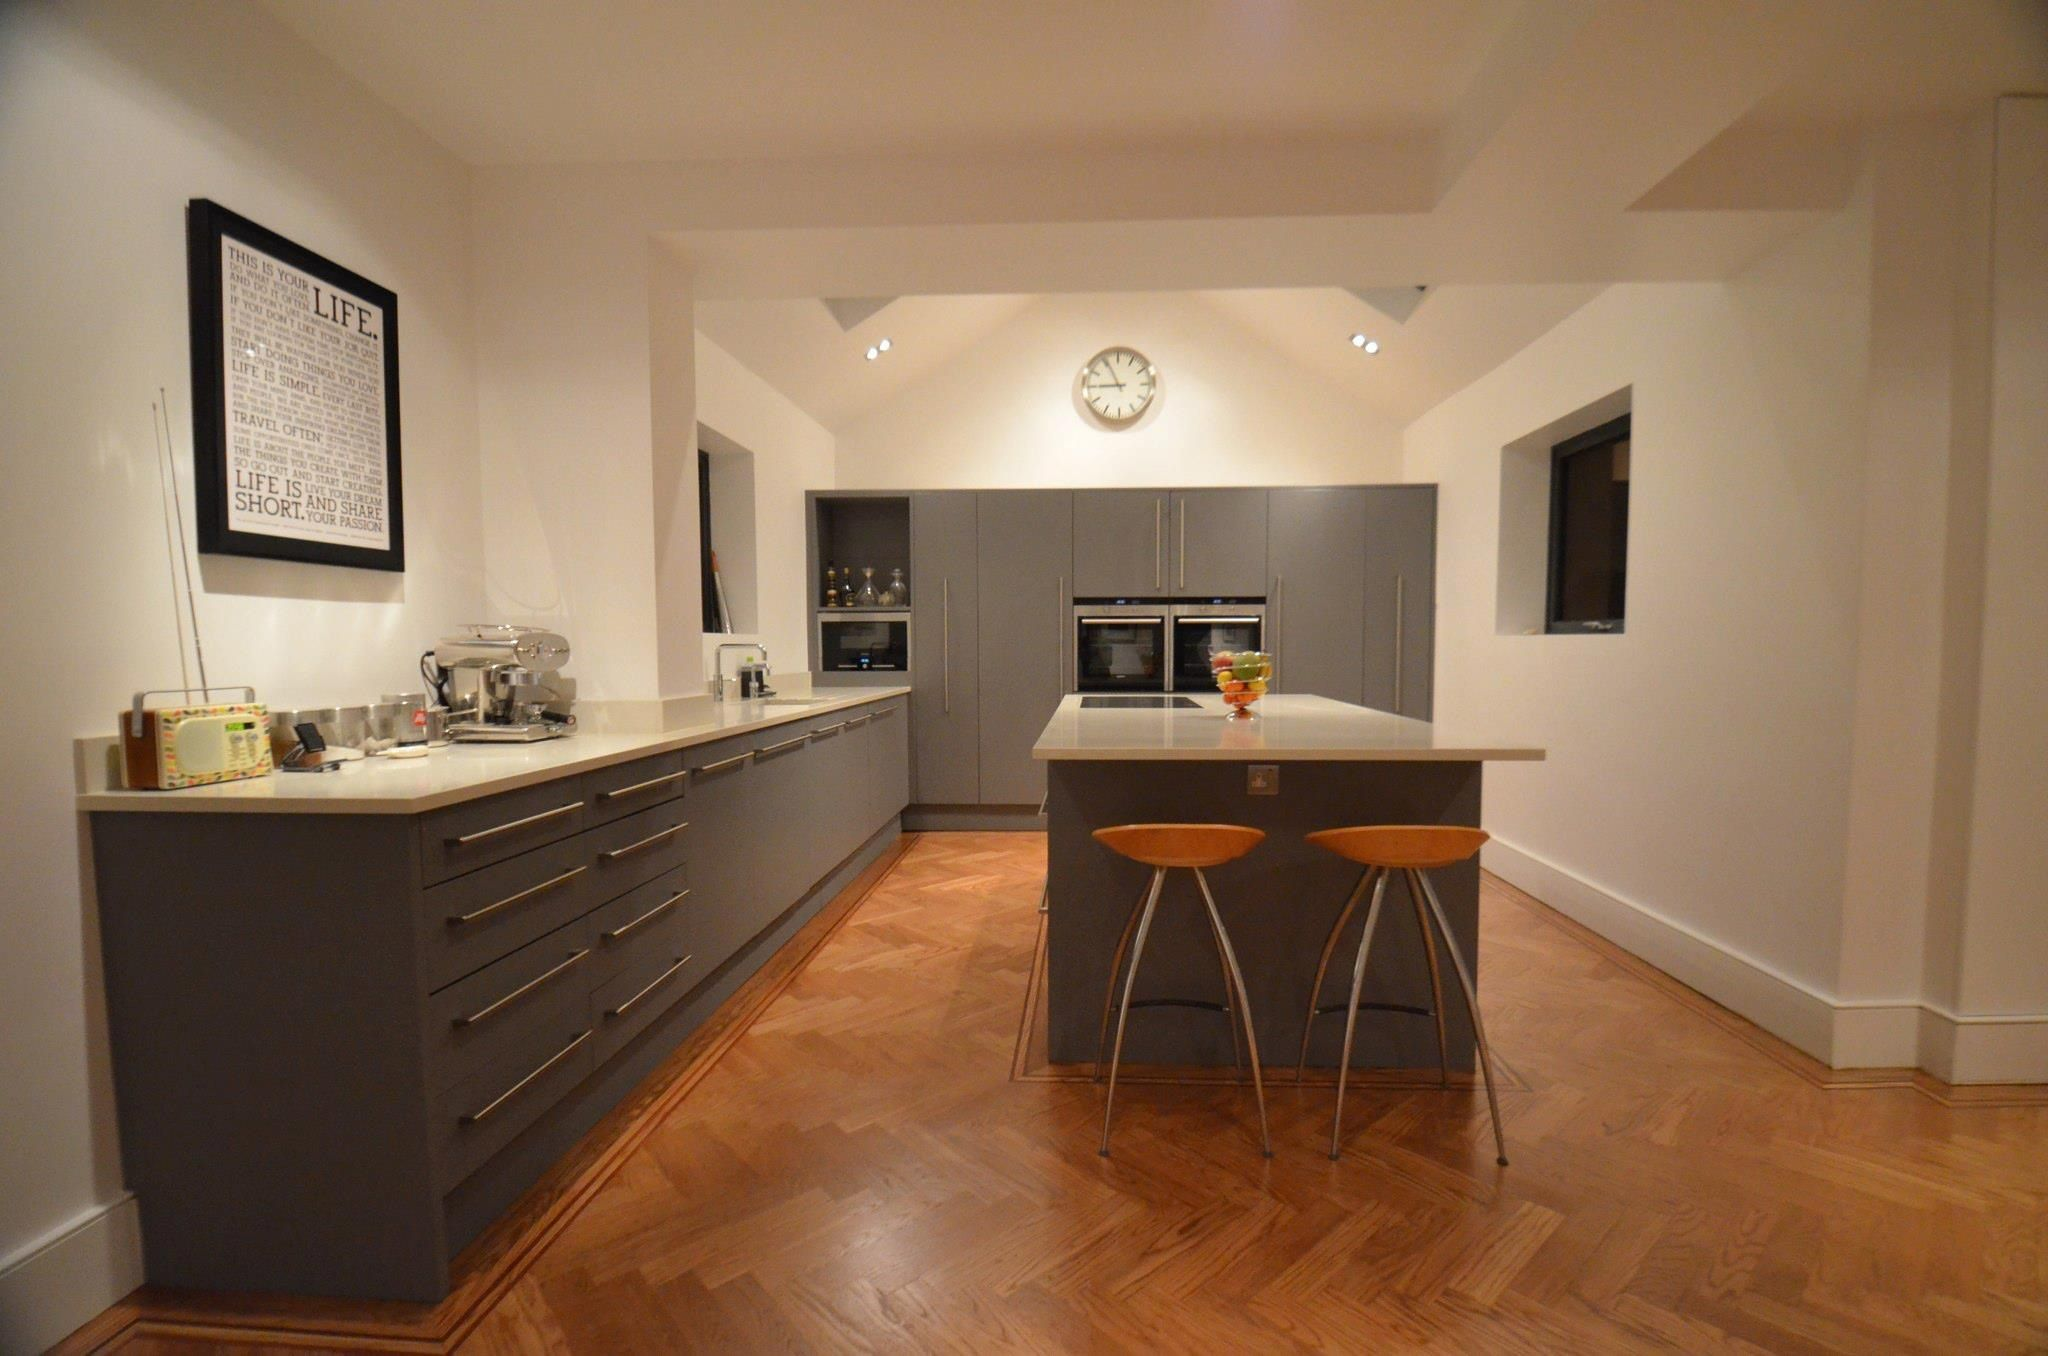 Kitchen Island John Lewis finished kitchen. unitsjohn lewis of hungerford, flooring